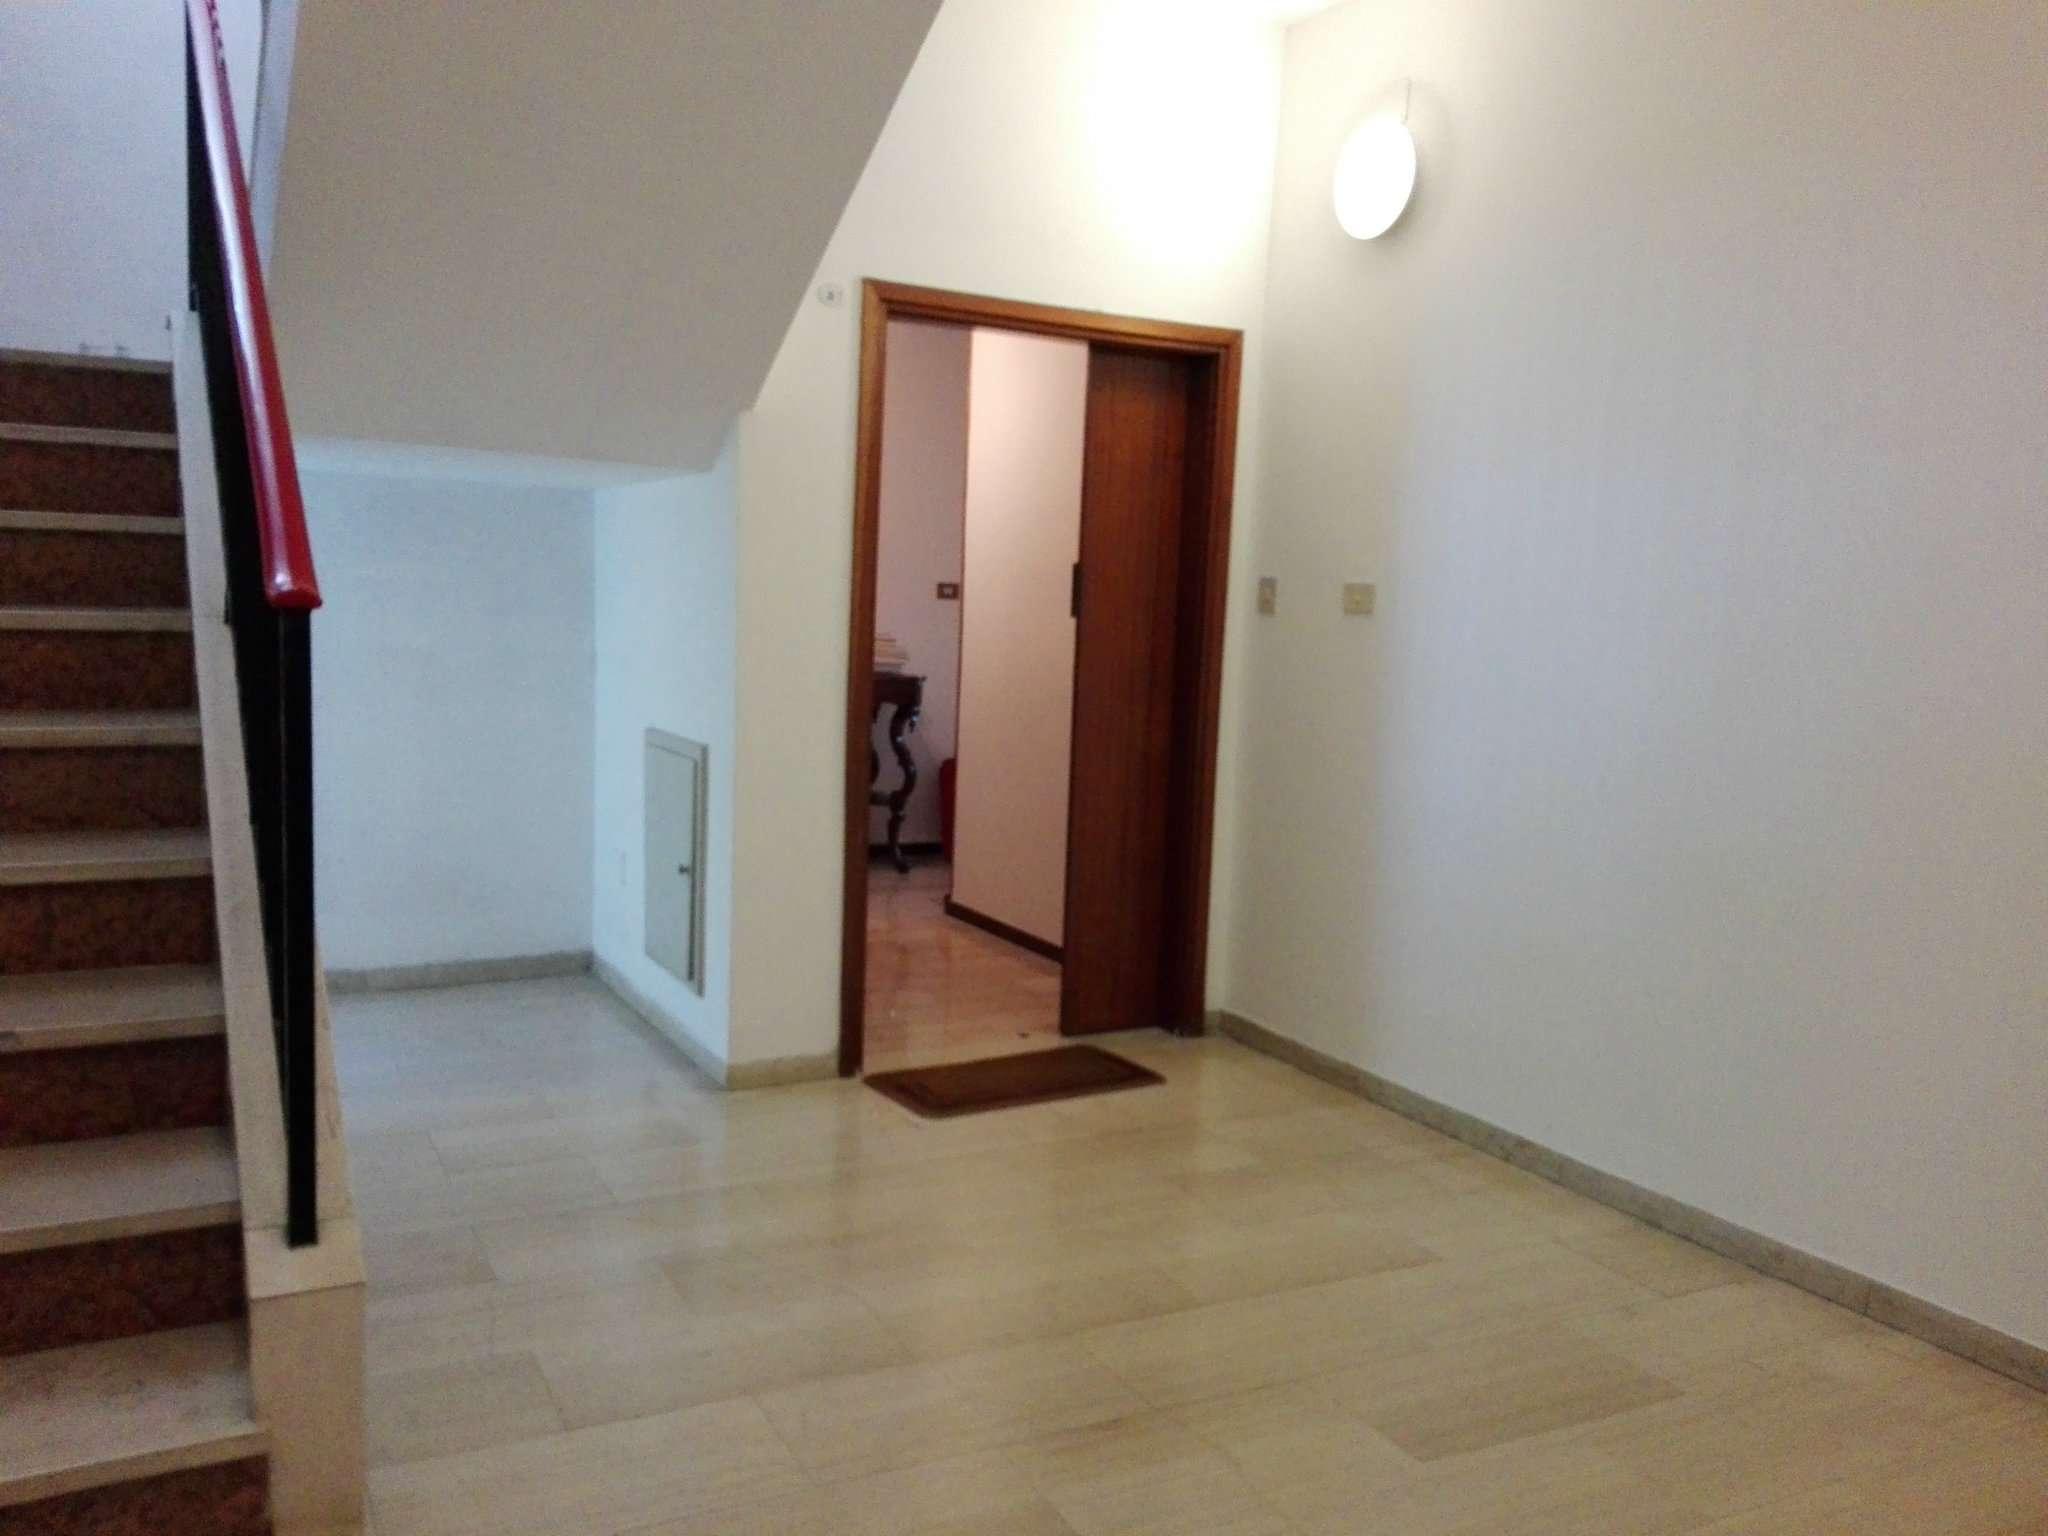 Foto 1 di Appartamento via Salara, Ravenna (zona Centro Storico)